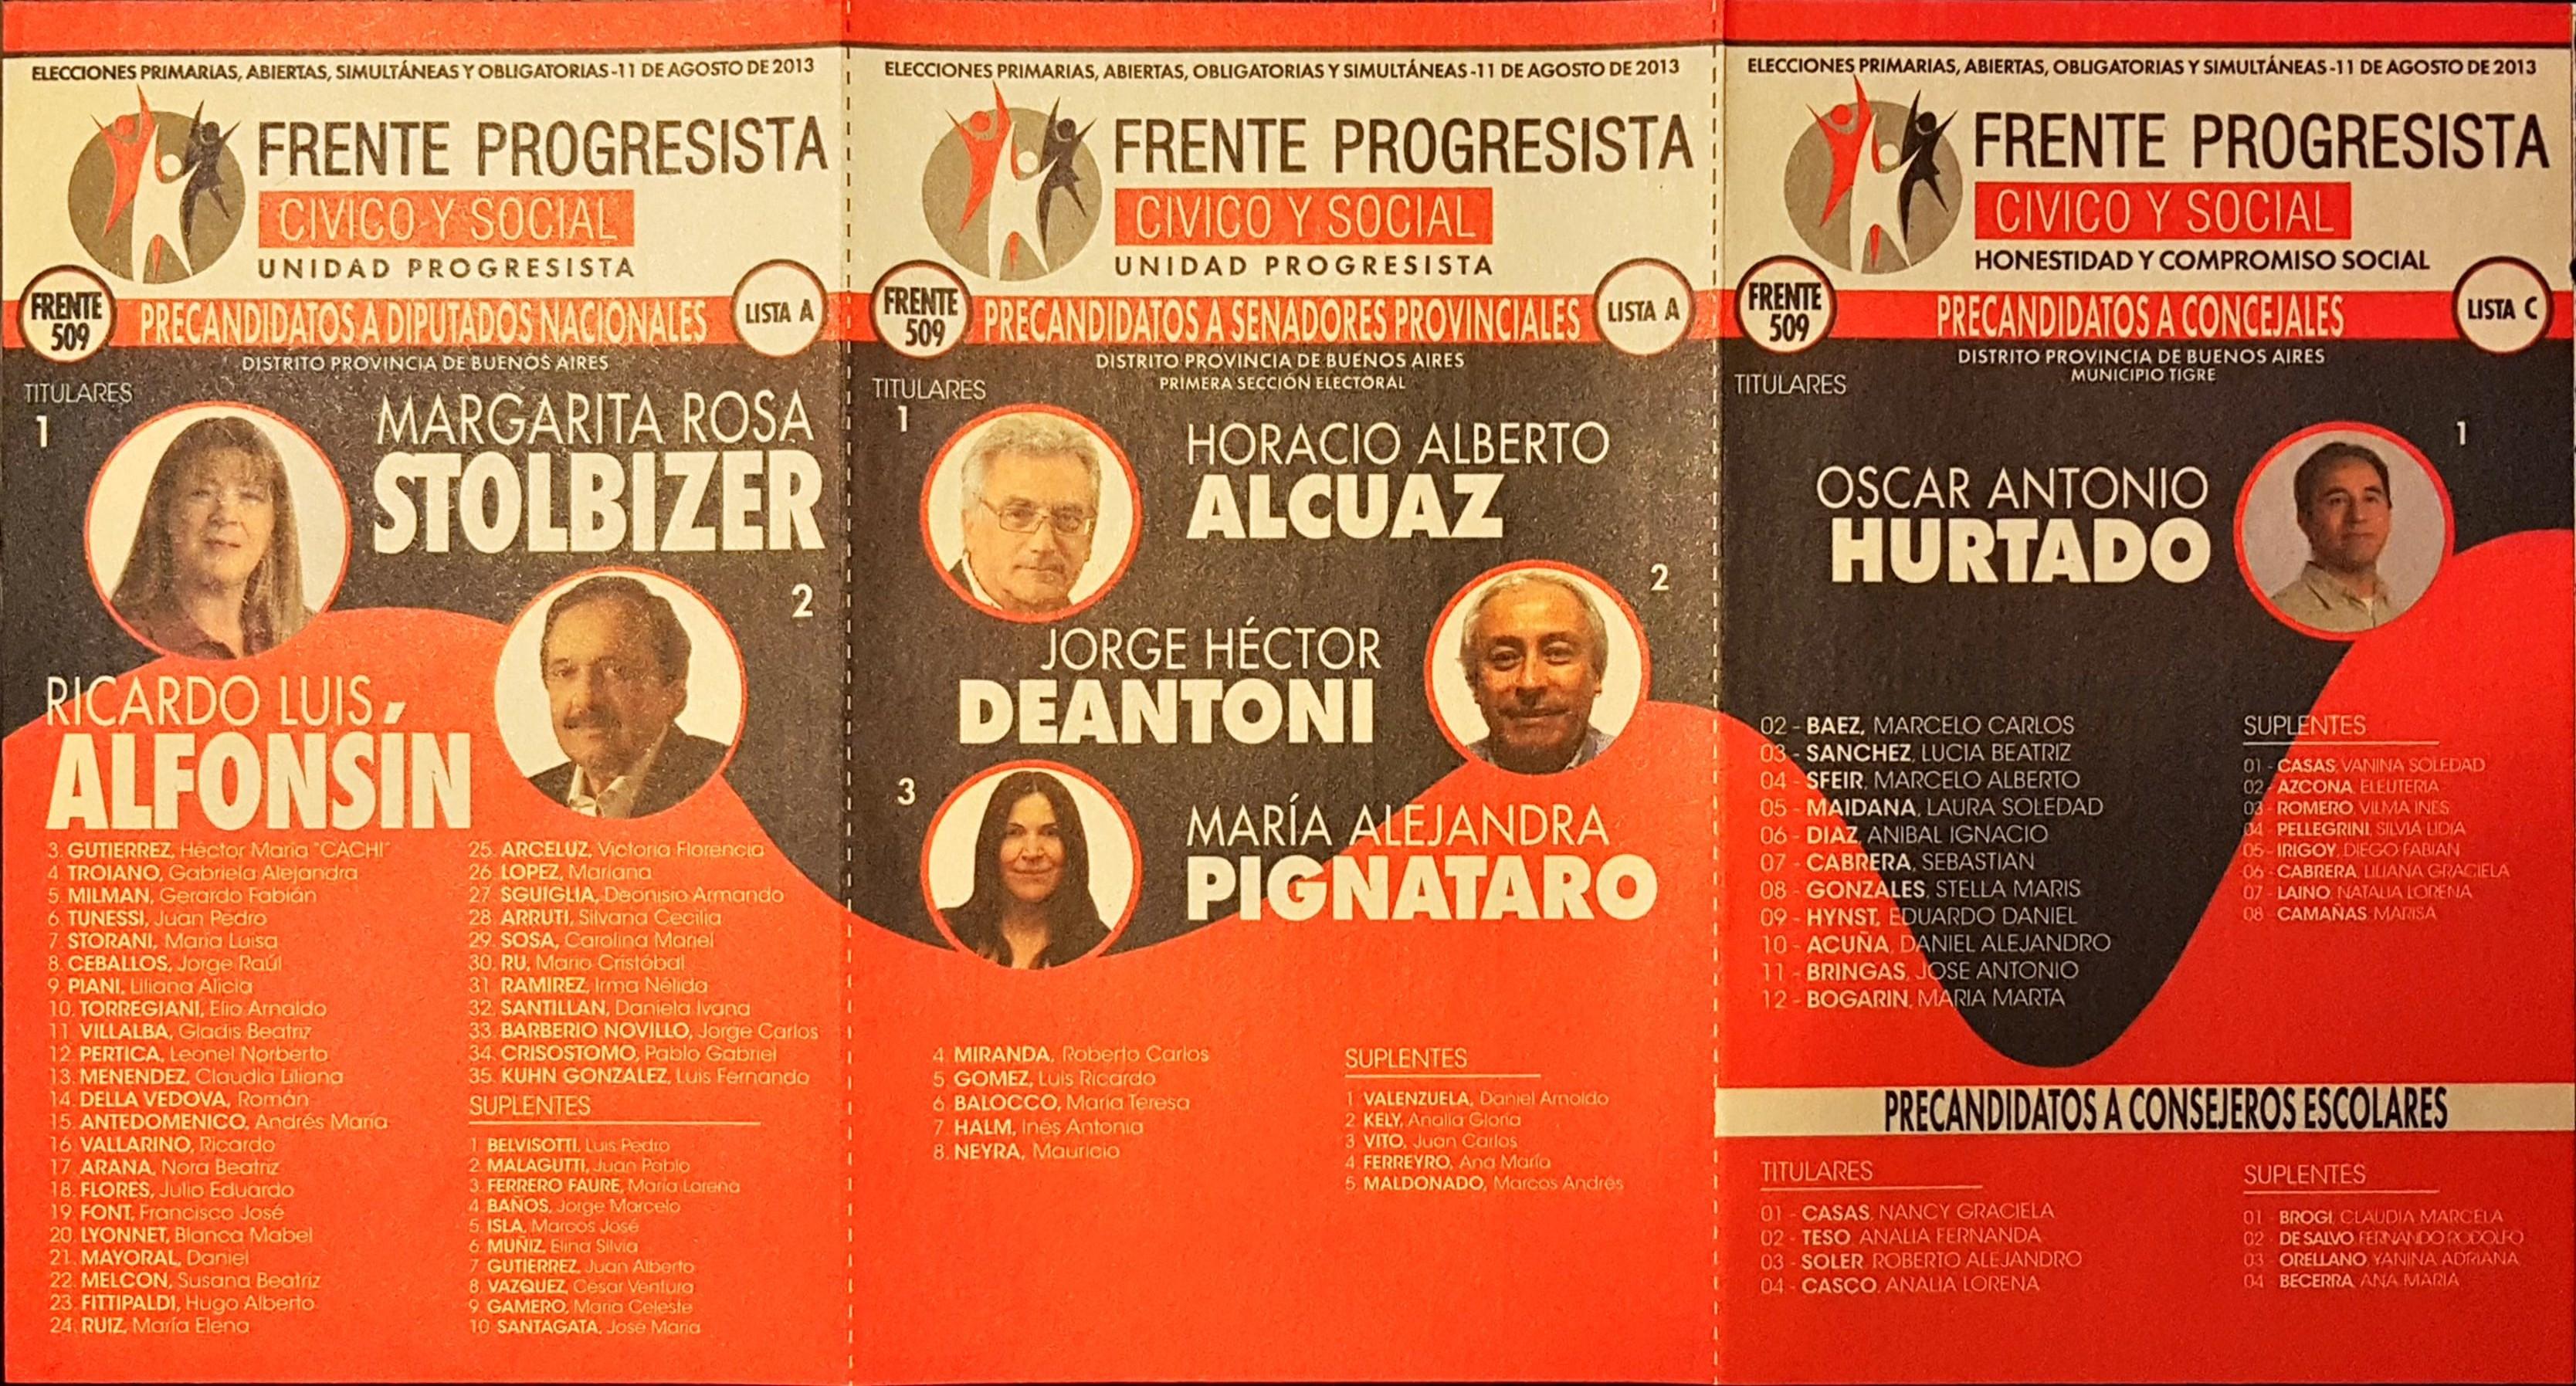 Frenteprogresistacivicosocial2013 g ephemera biblioteca e frenteprogresistacivicosocial2013 g fandeluxe Gallery